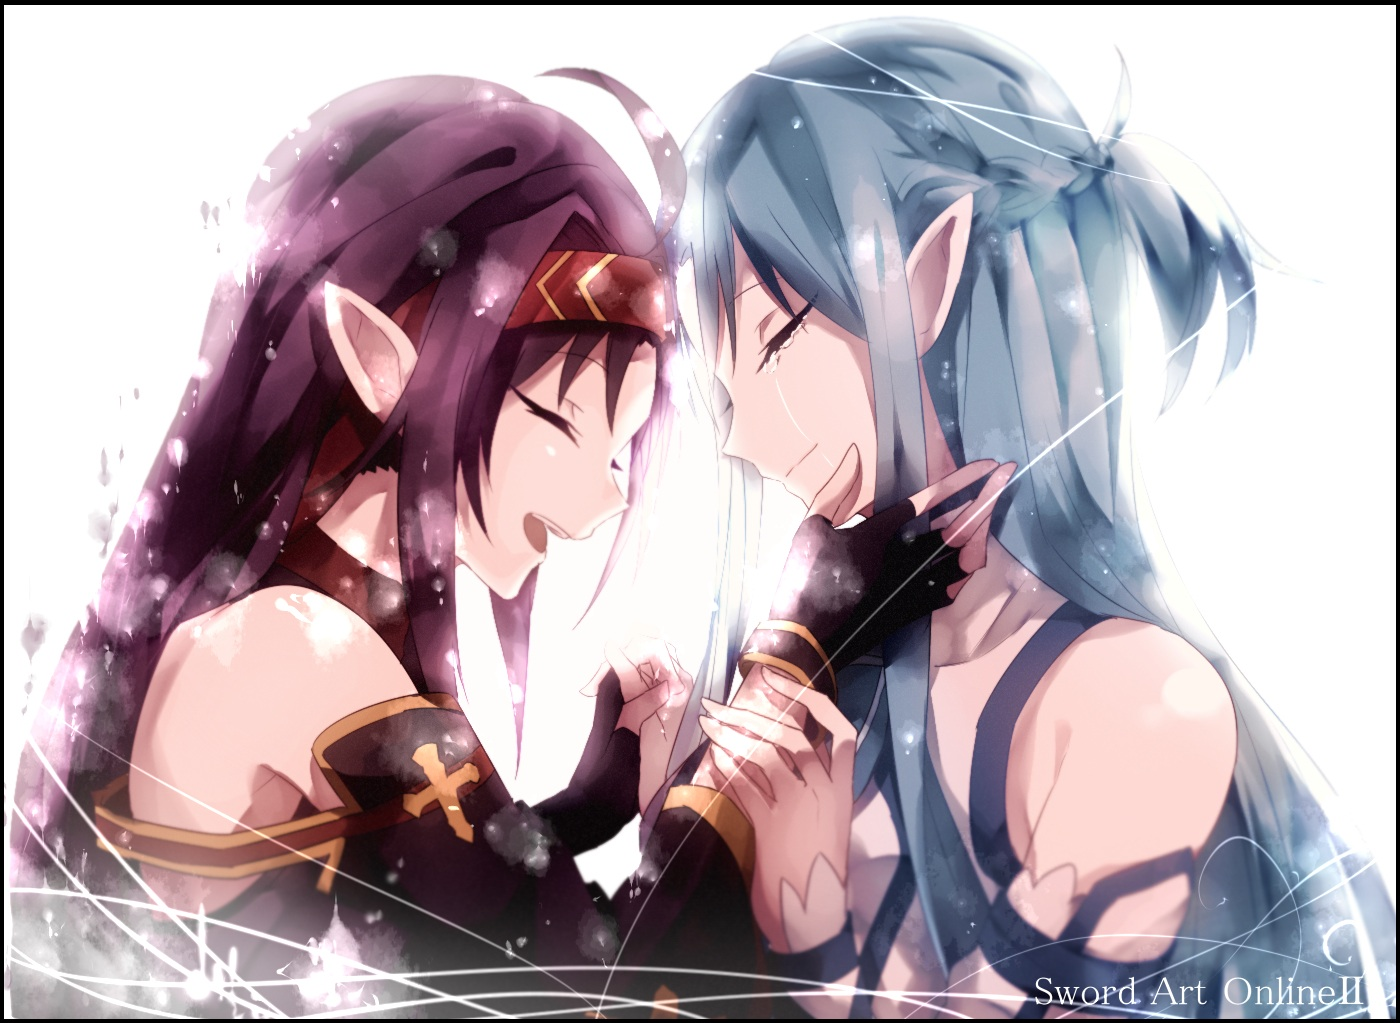 Asuna and Yuuki